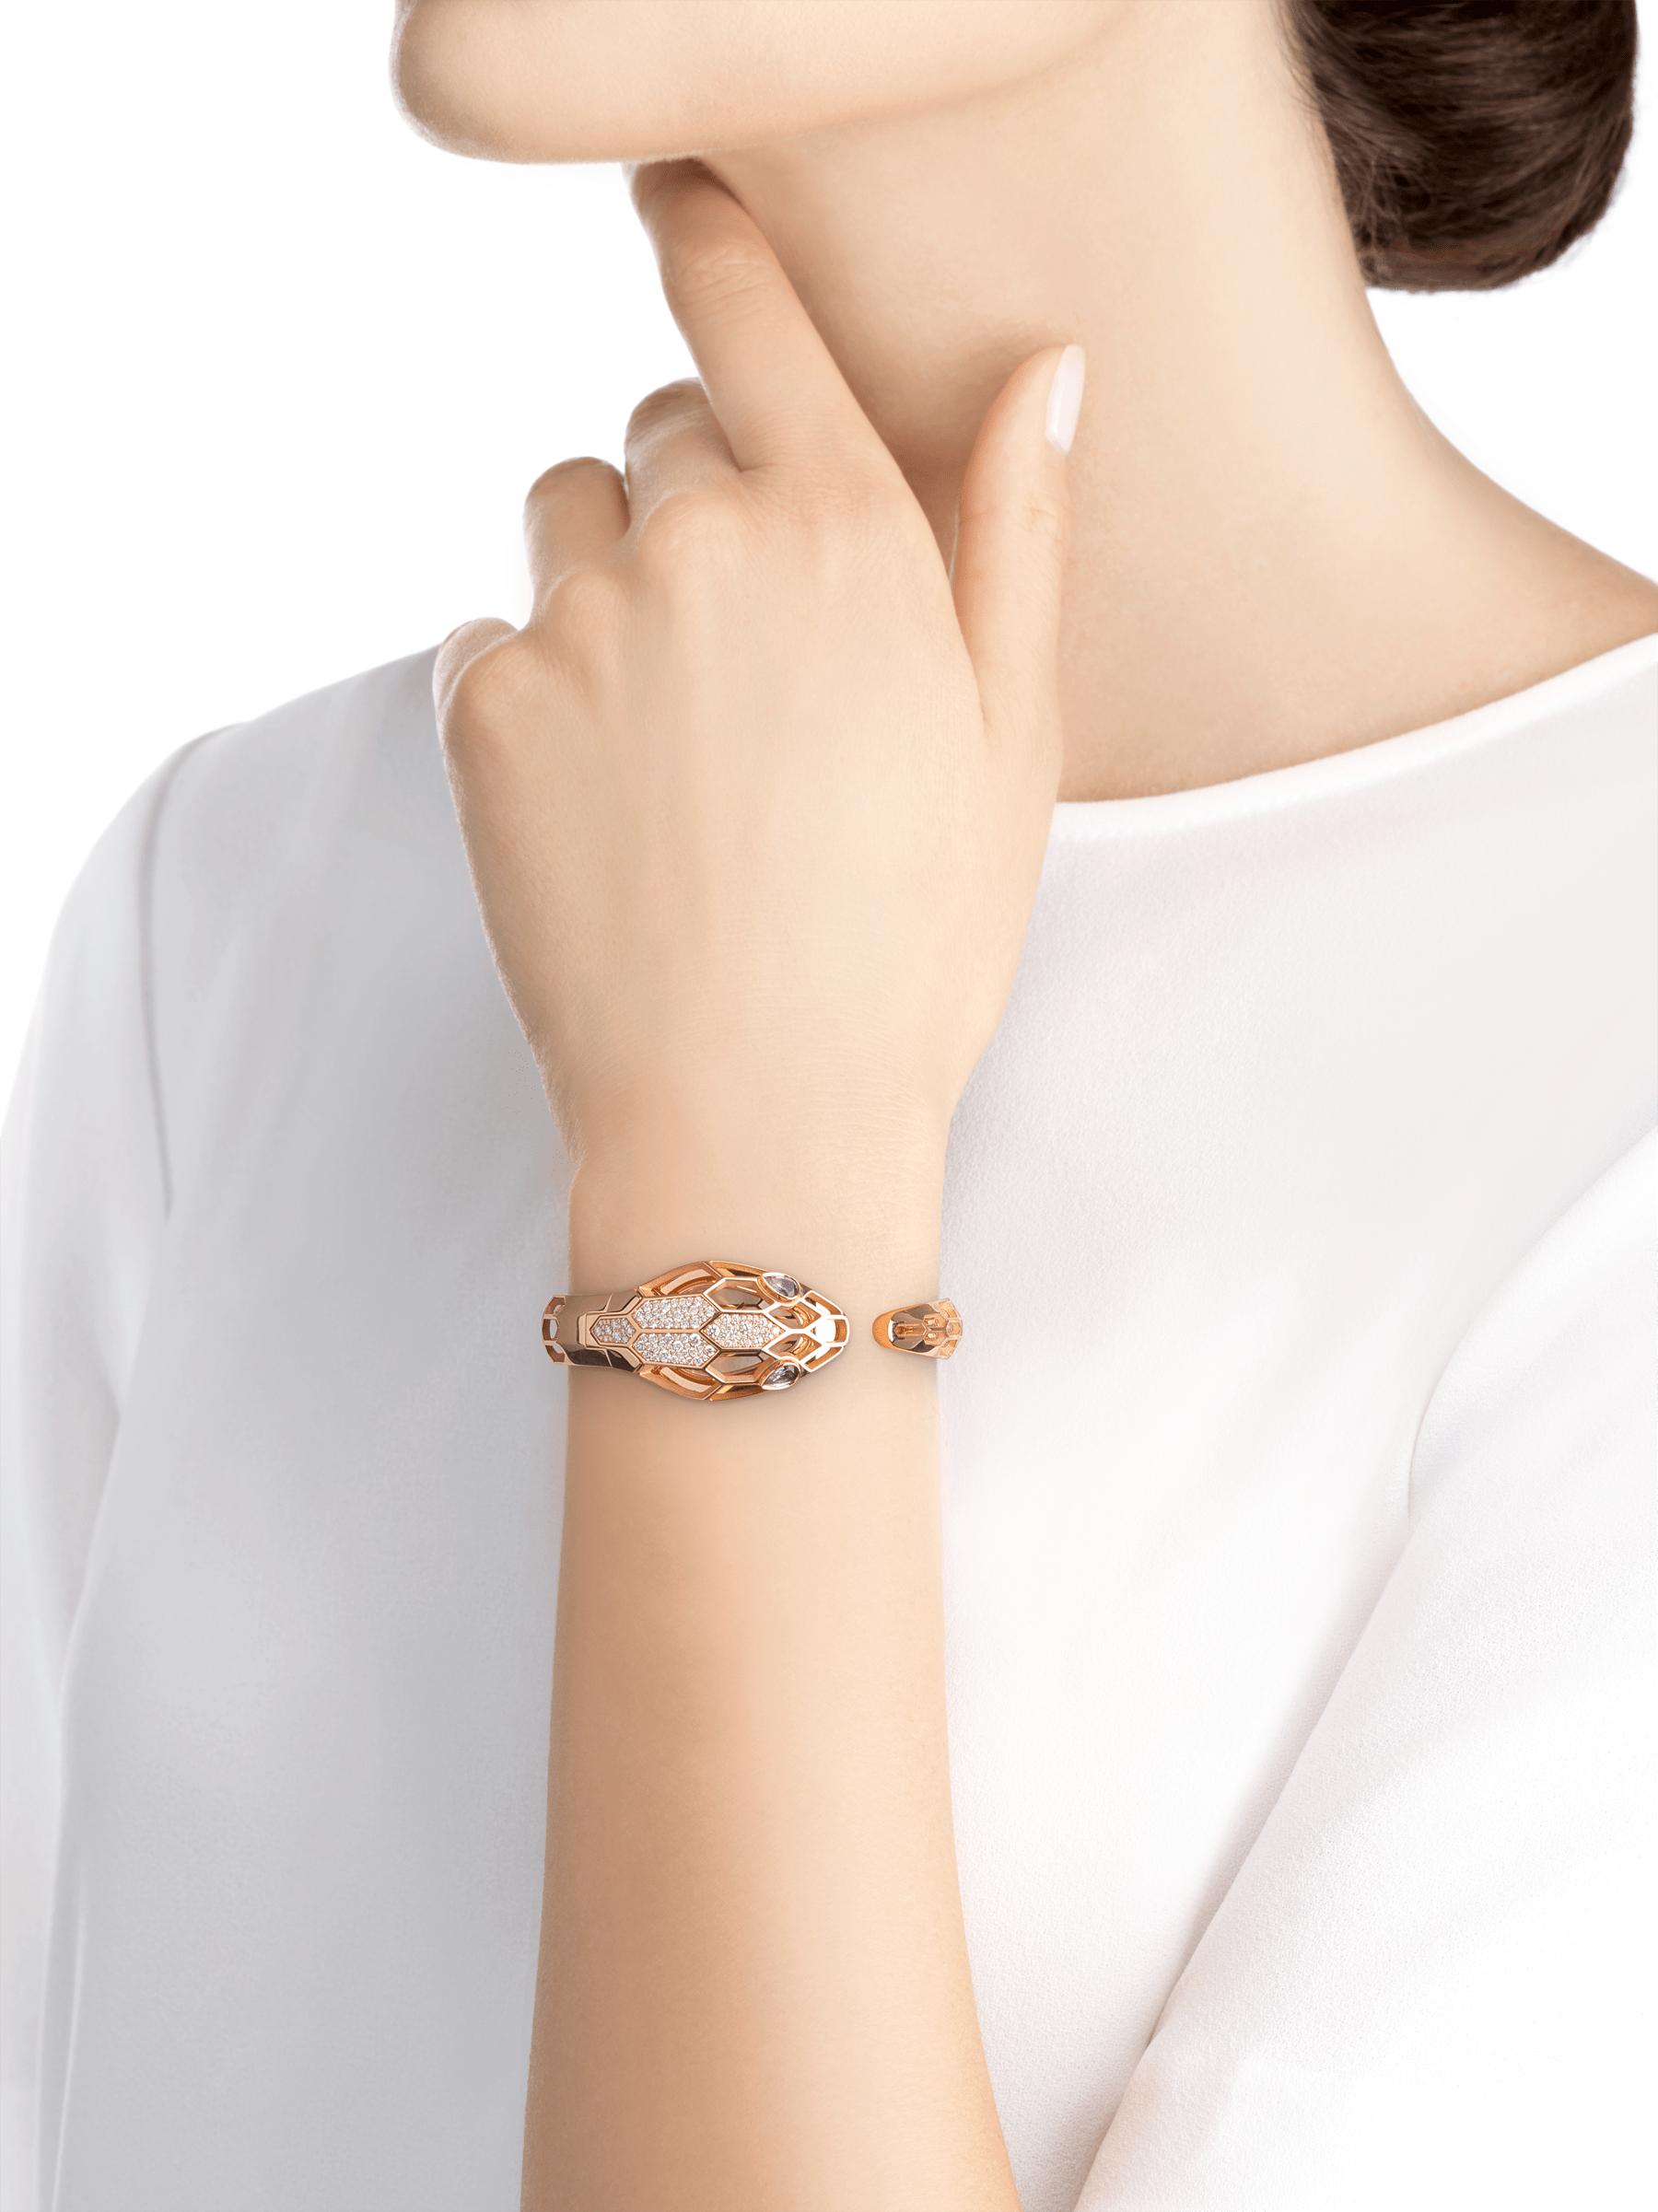 Serpenti Misteriosi Secret 腕錶,18K 玫瑰金鏤空錶殼鑲飾圓形明亮型切割鑽石,白色珍珠母貝錶盤,18K 玫瑰金鏤空手鐲式錶帶,蛇眼鑲飾梨形紫水晶。M 尺寸。 SrpntMister-SecretWtc-rose-gold image 2